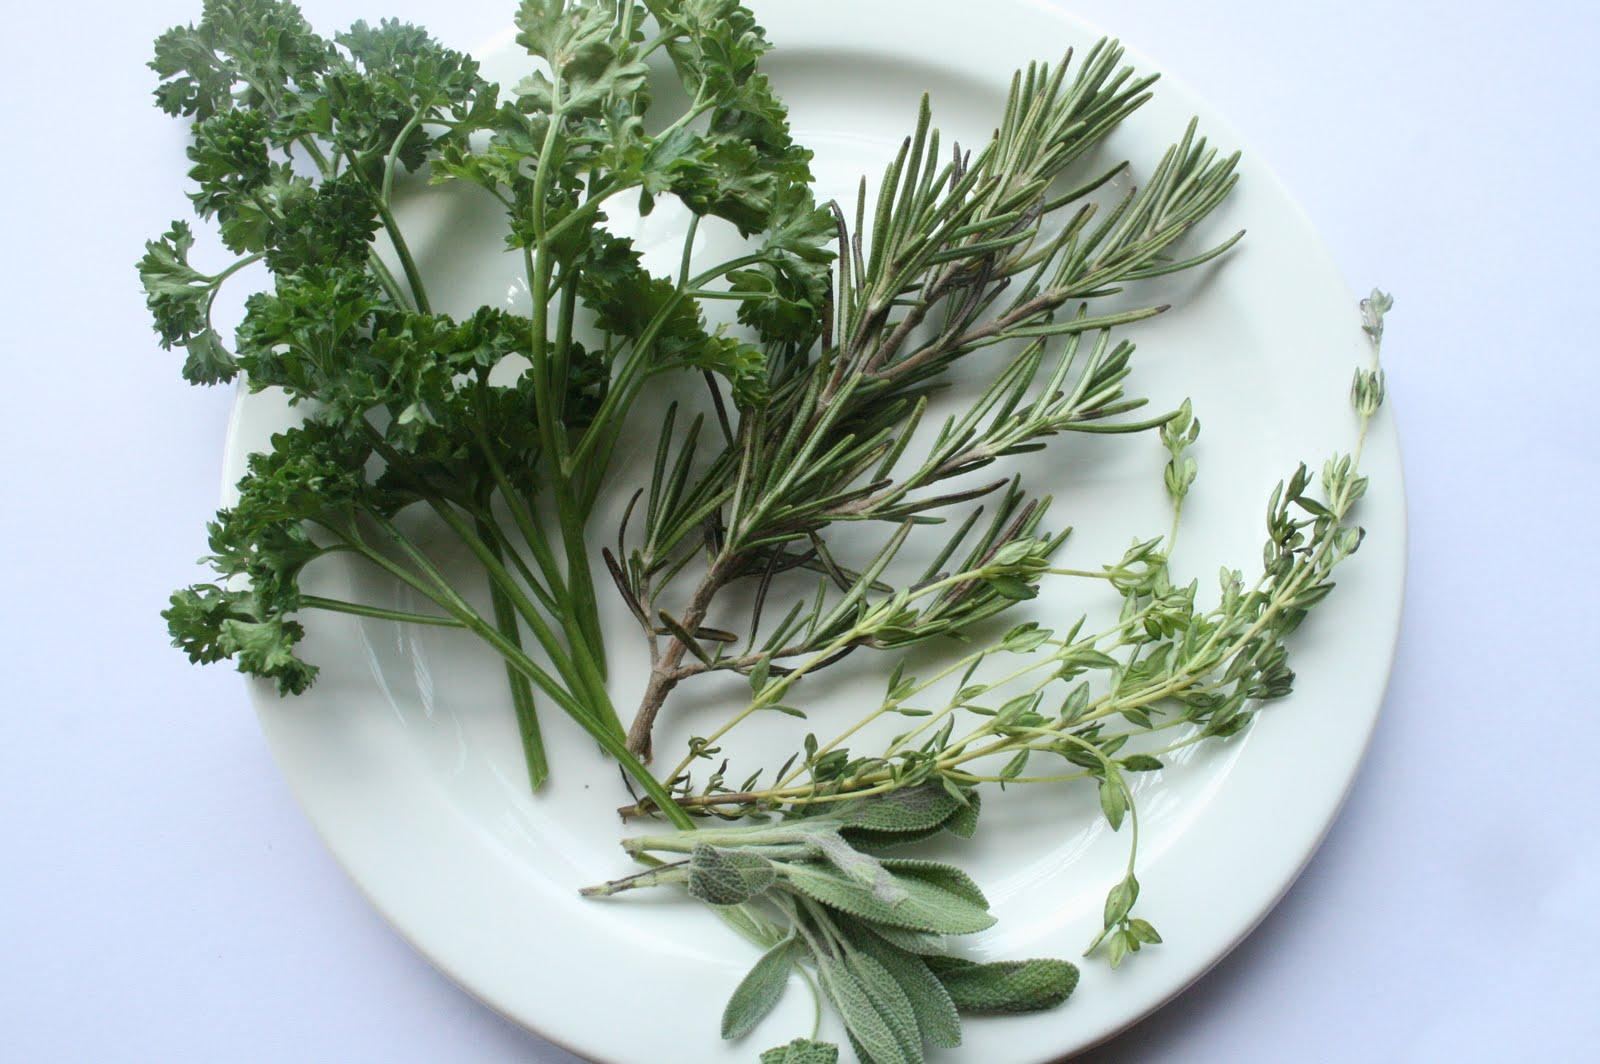 Italian Seasoning or Rub (Parsley, Sage, Rosemary & Thyme)